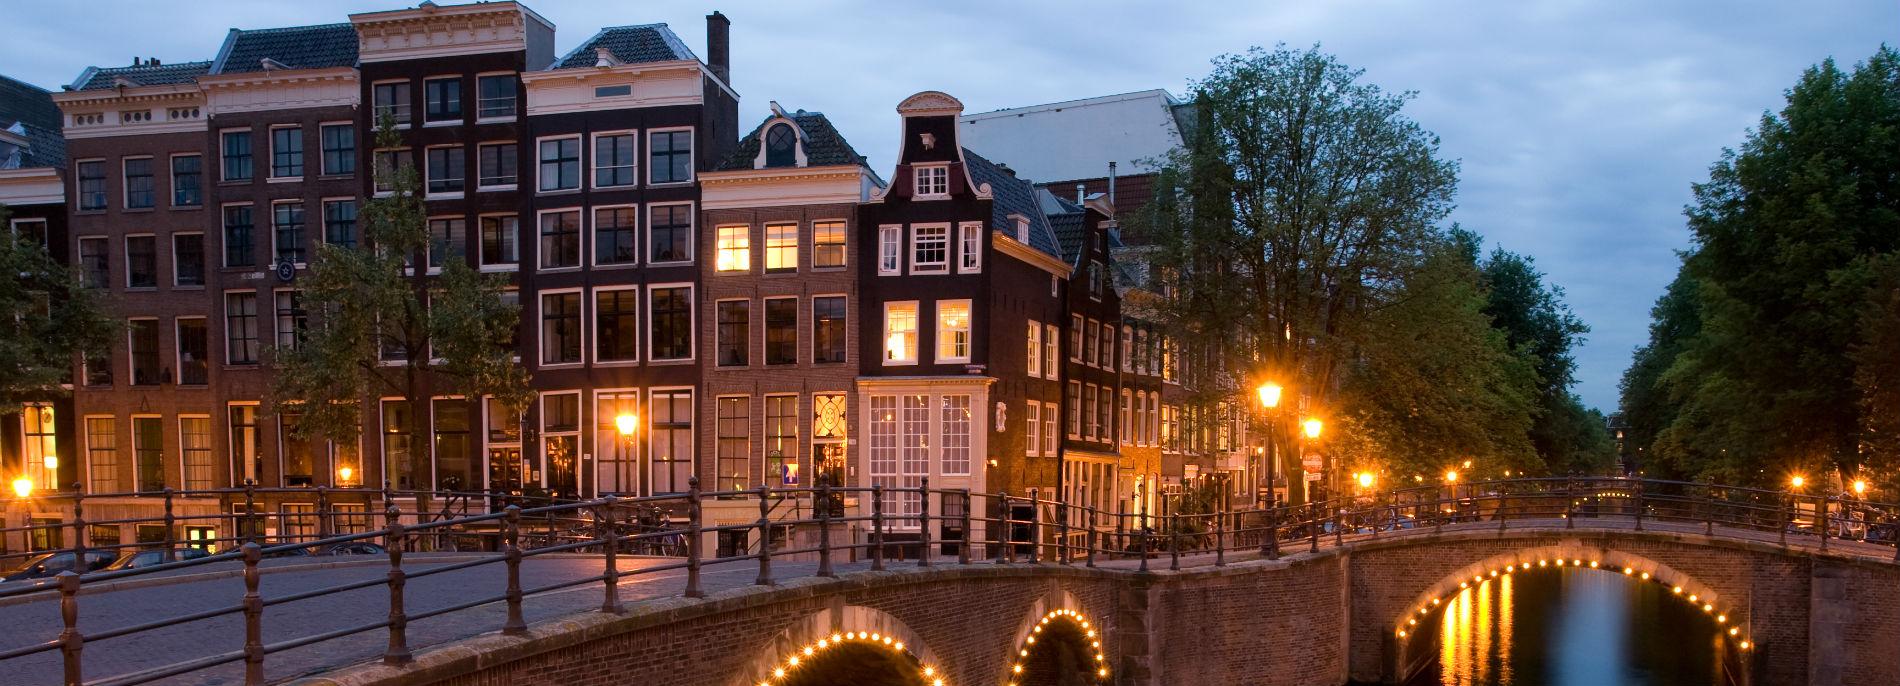 airbnb-amsterdam-stadsoverview